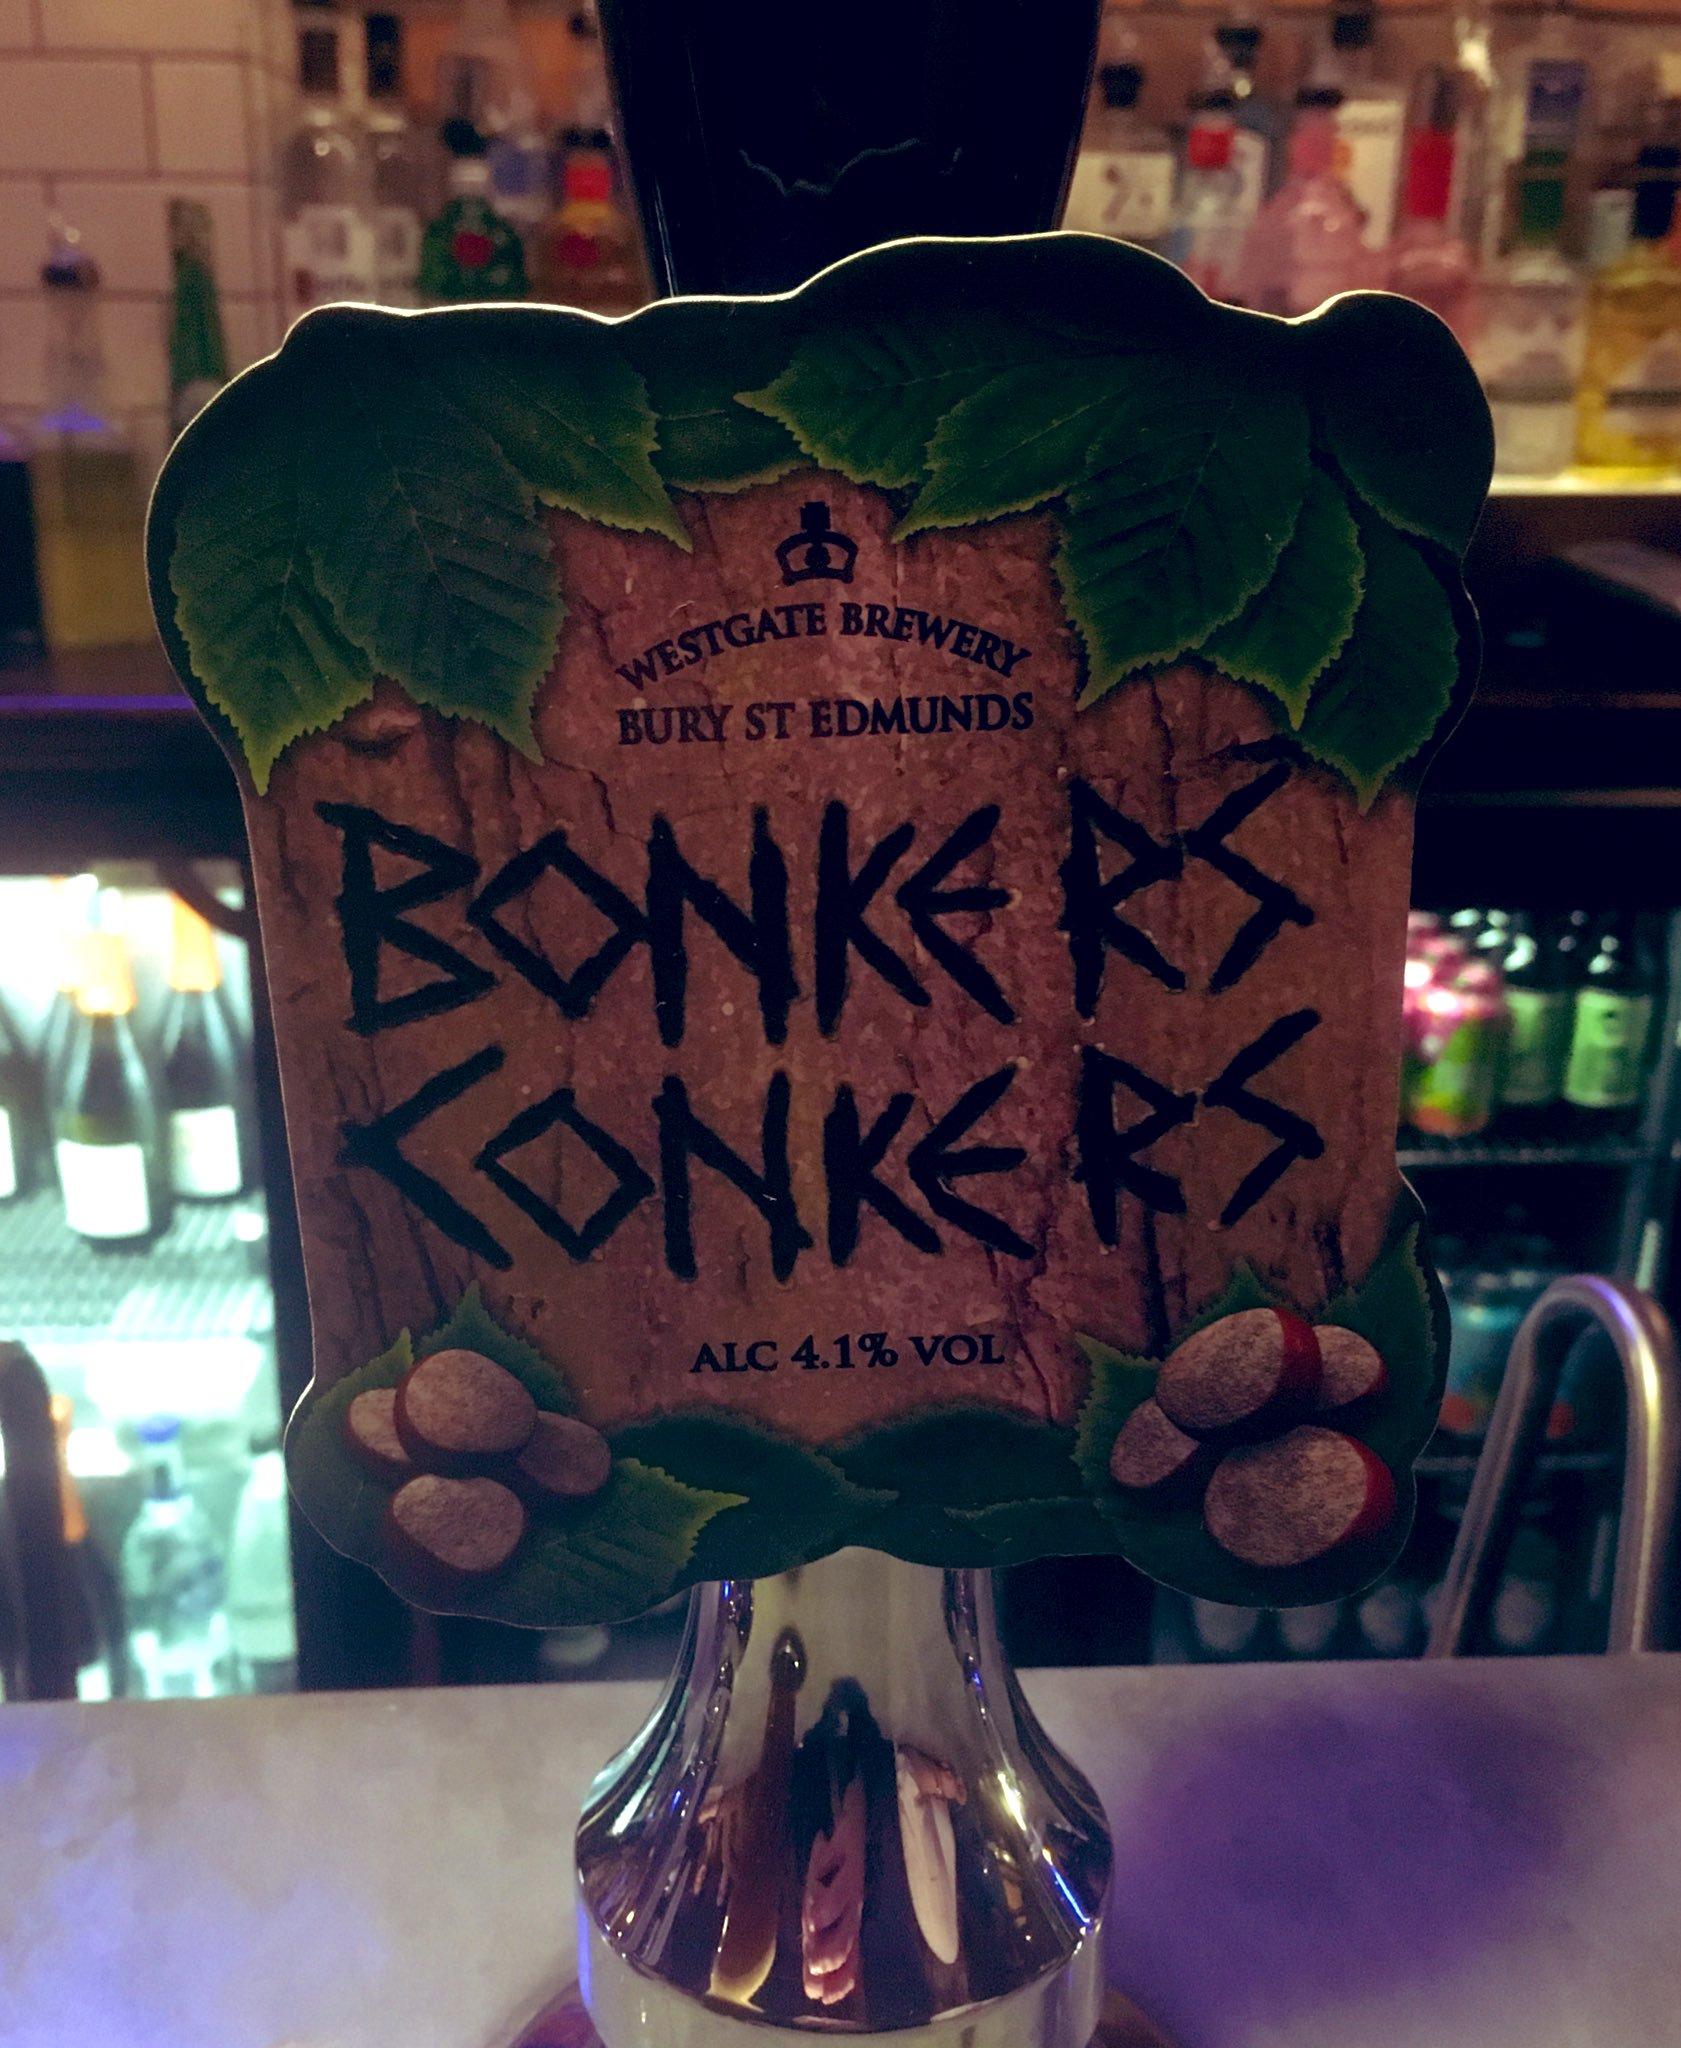 296: Bonkers Conkers